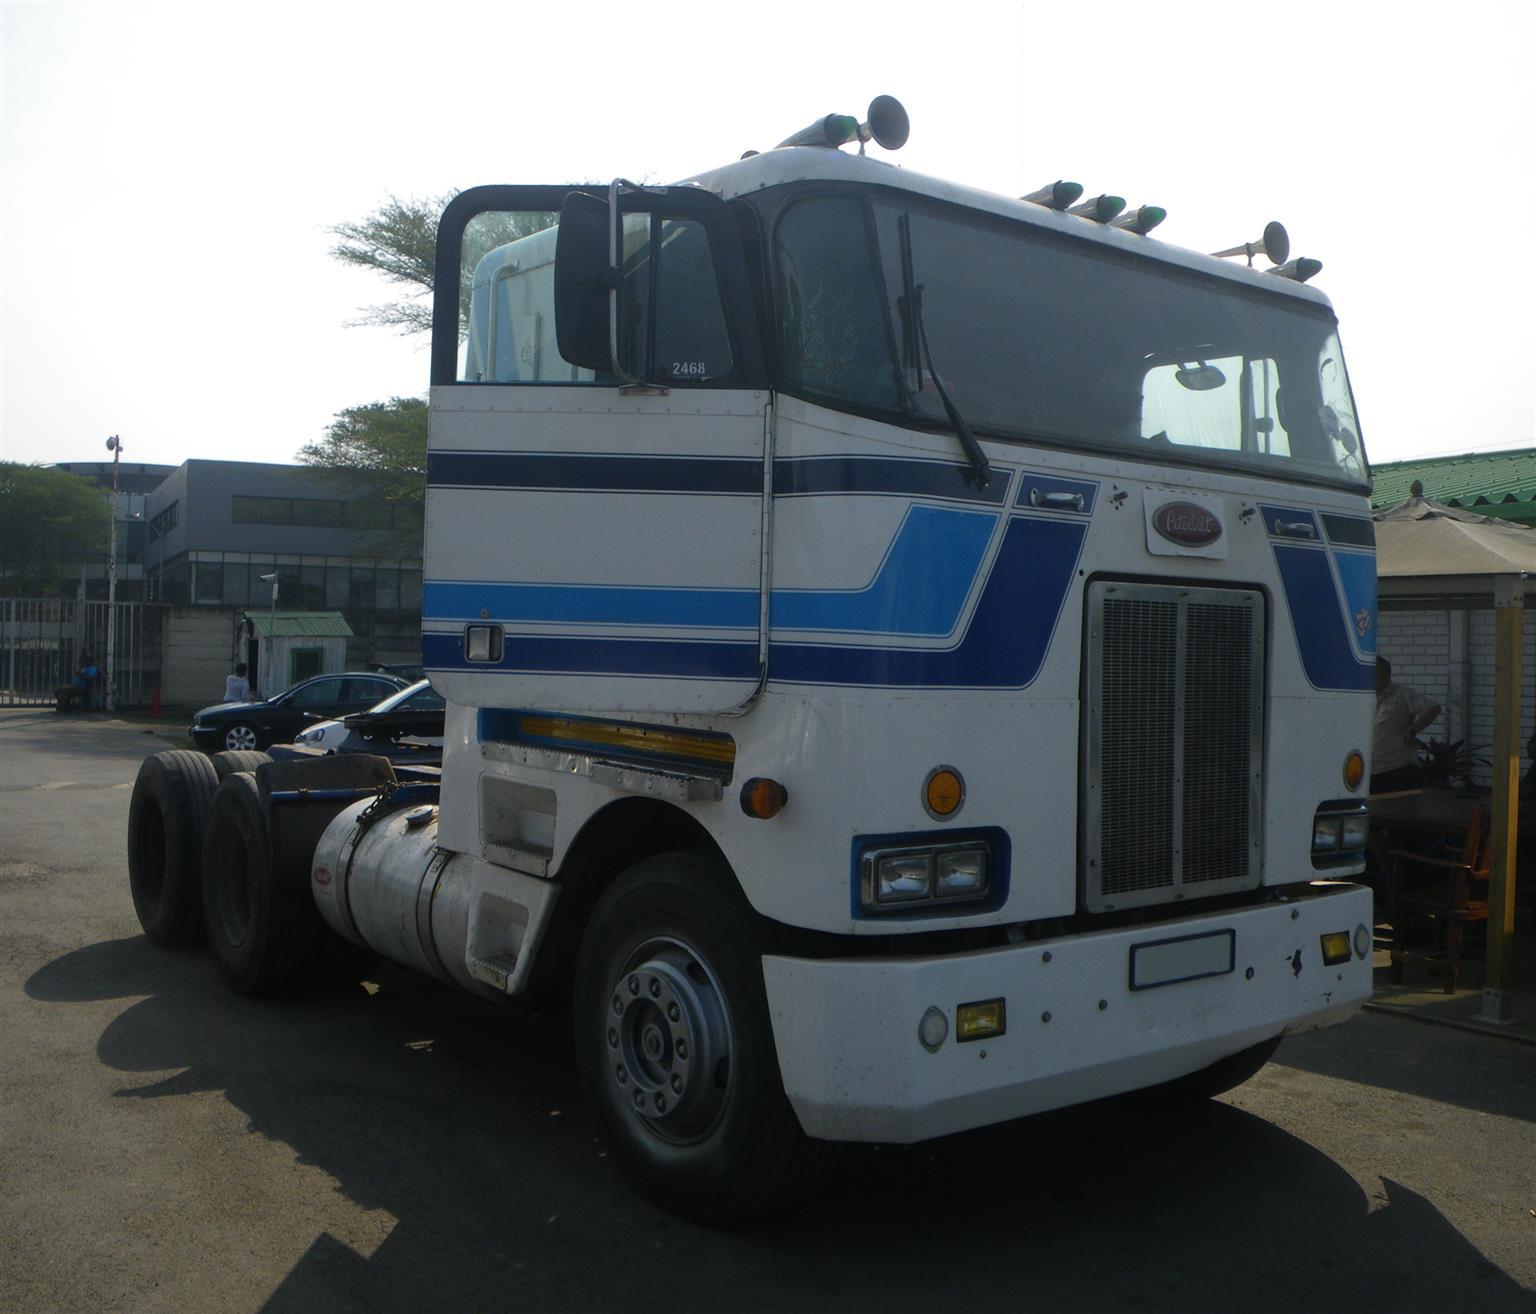 2000 Pieterbilt double diff truck tracktor - AA2481